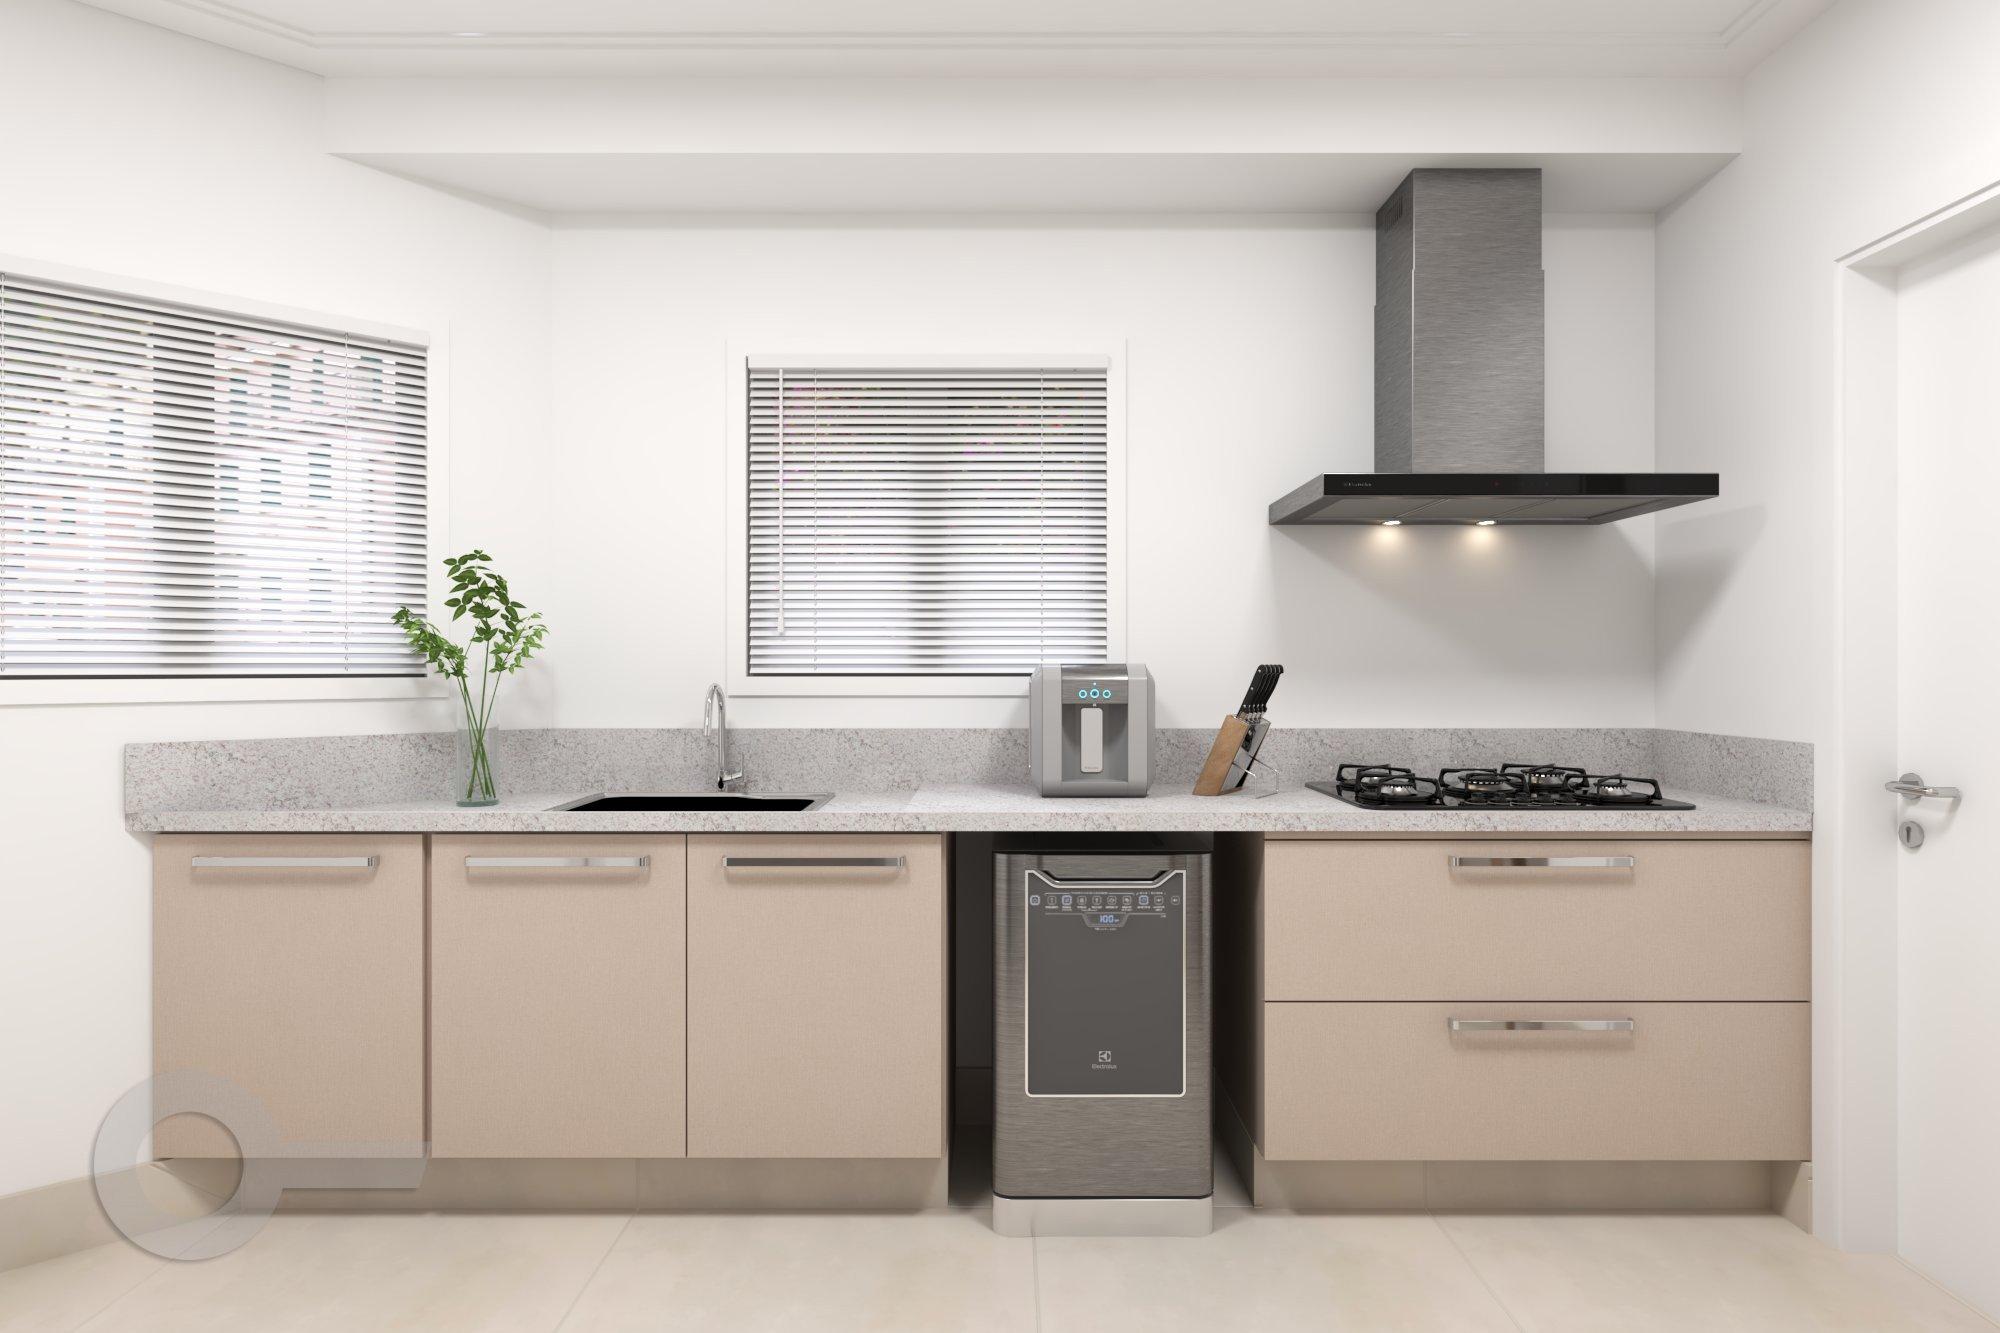 desktop_kitchen01.jfif